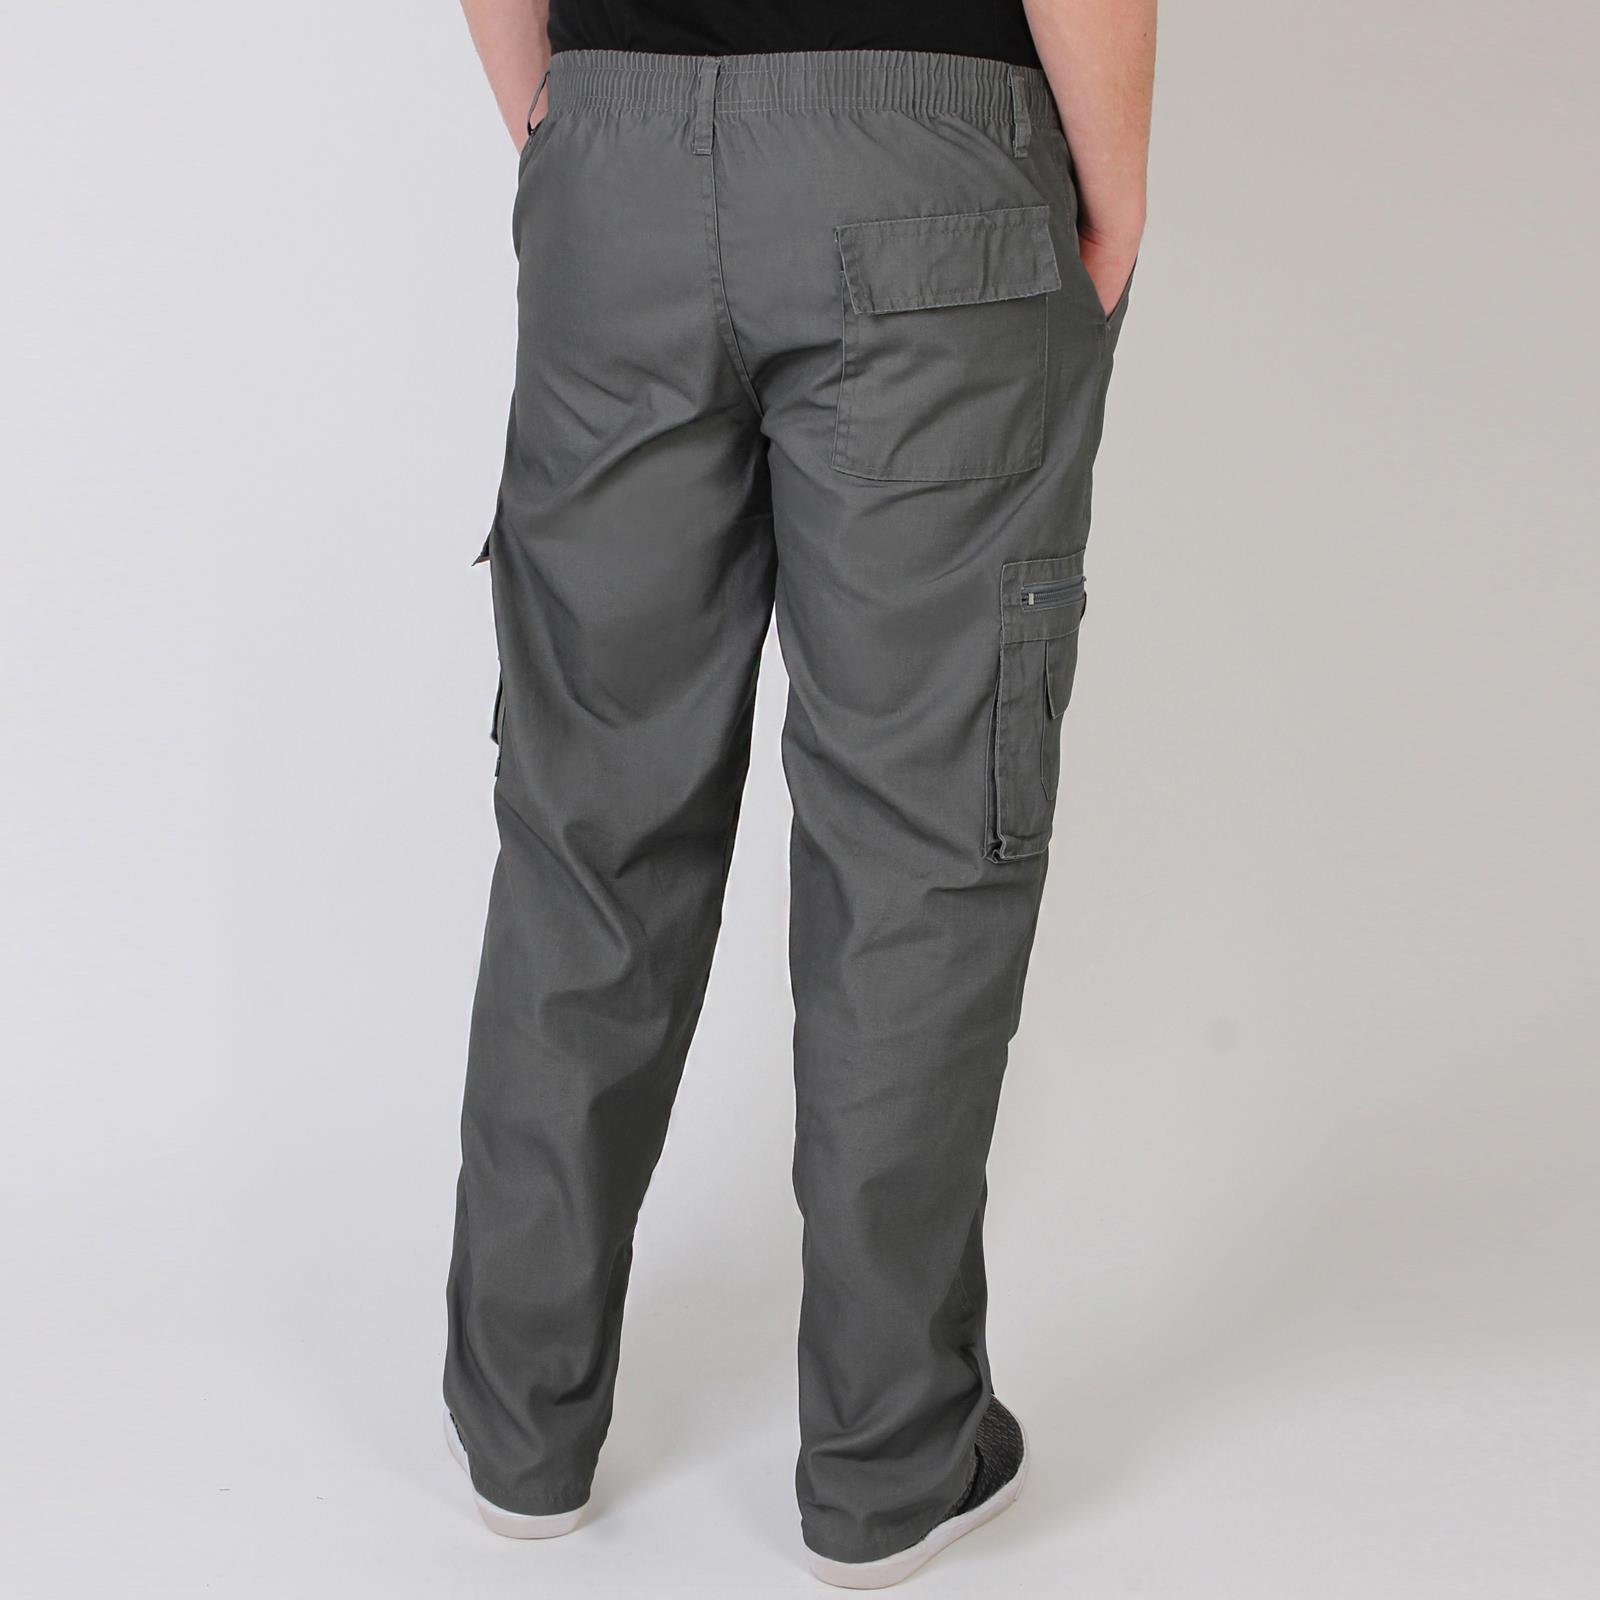 Pantalones-Hombre-Estilo-Cargo-Militar-Combate-Multibolsillos-Casual miniatura 22